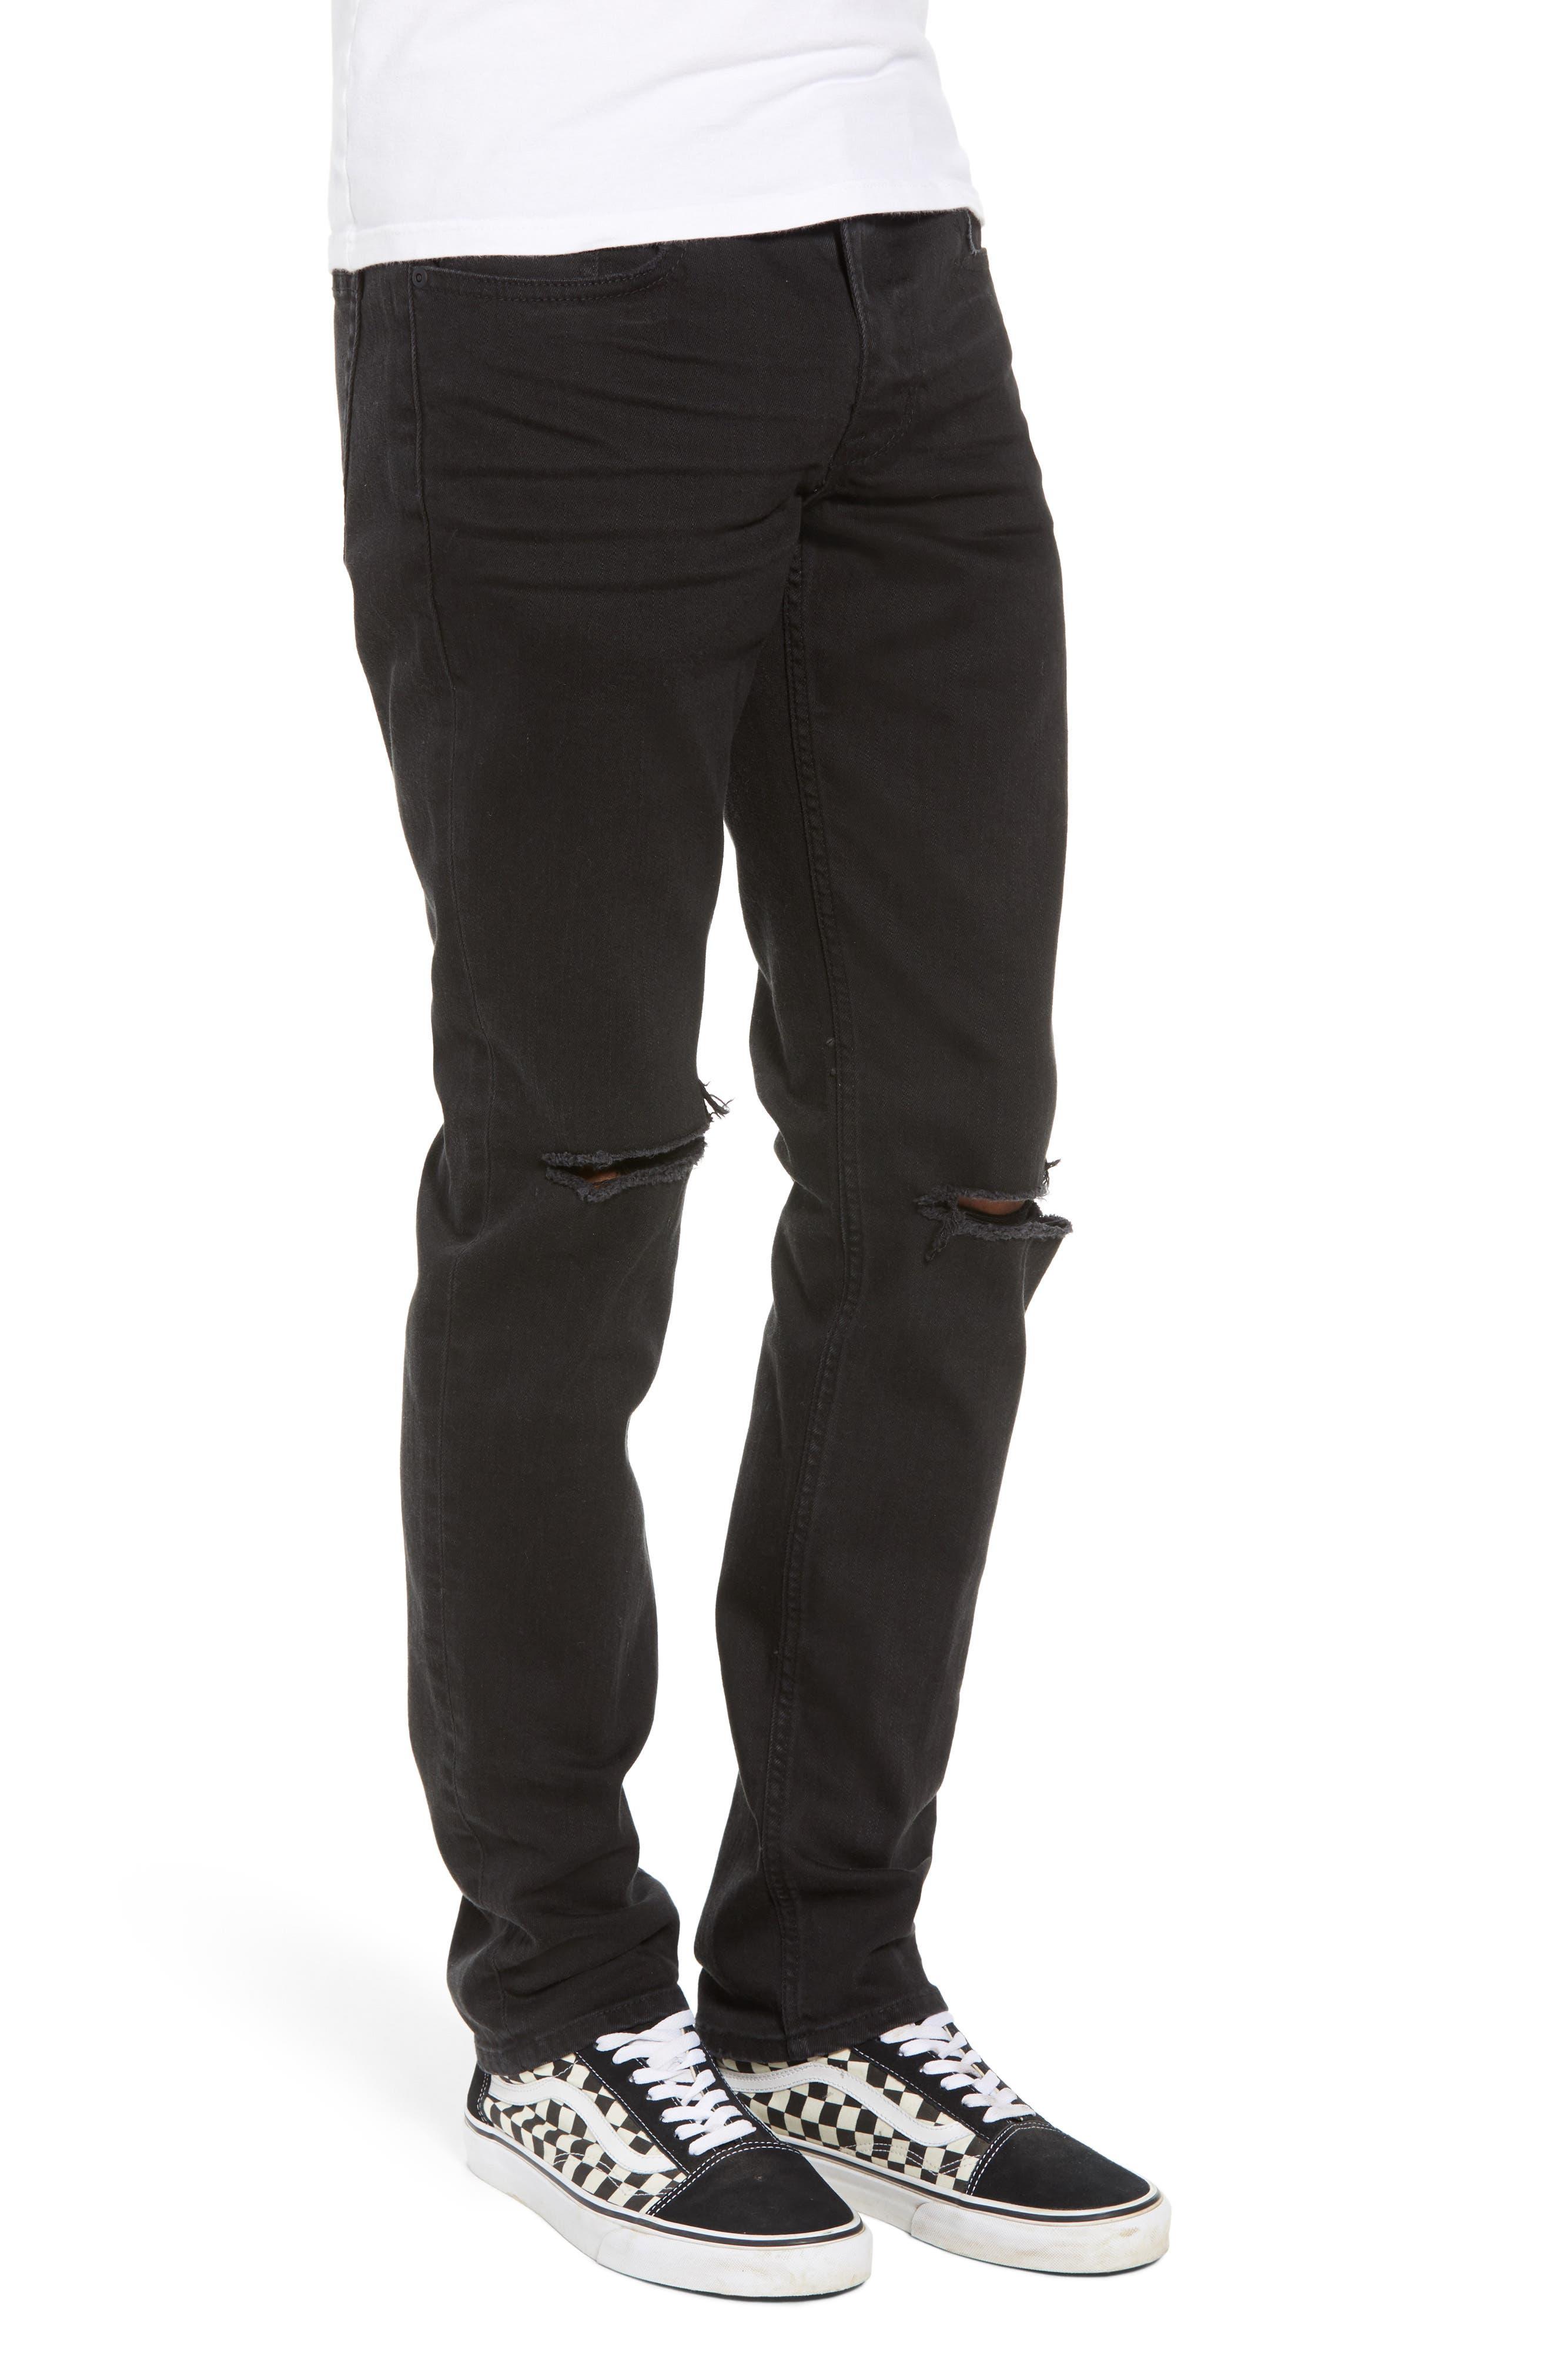 THE RAIL, Ripped Skinny Jeans, Alternate thumbnail 4, color, BLACK STONE WASH